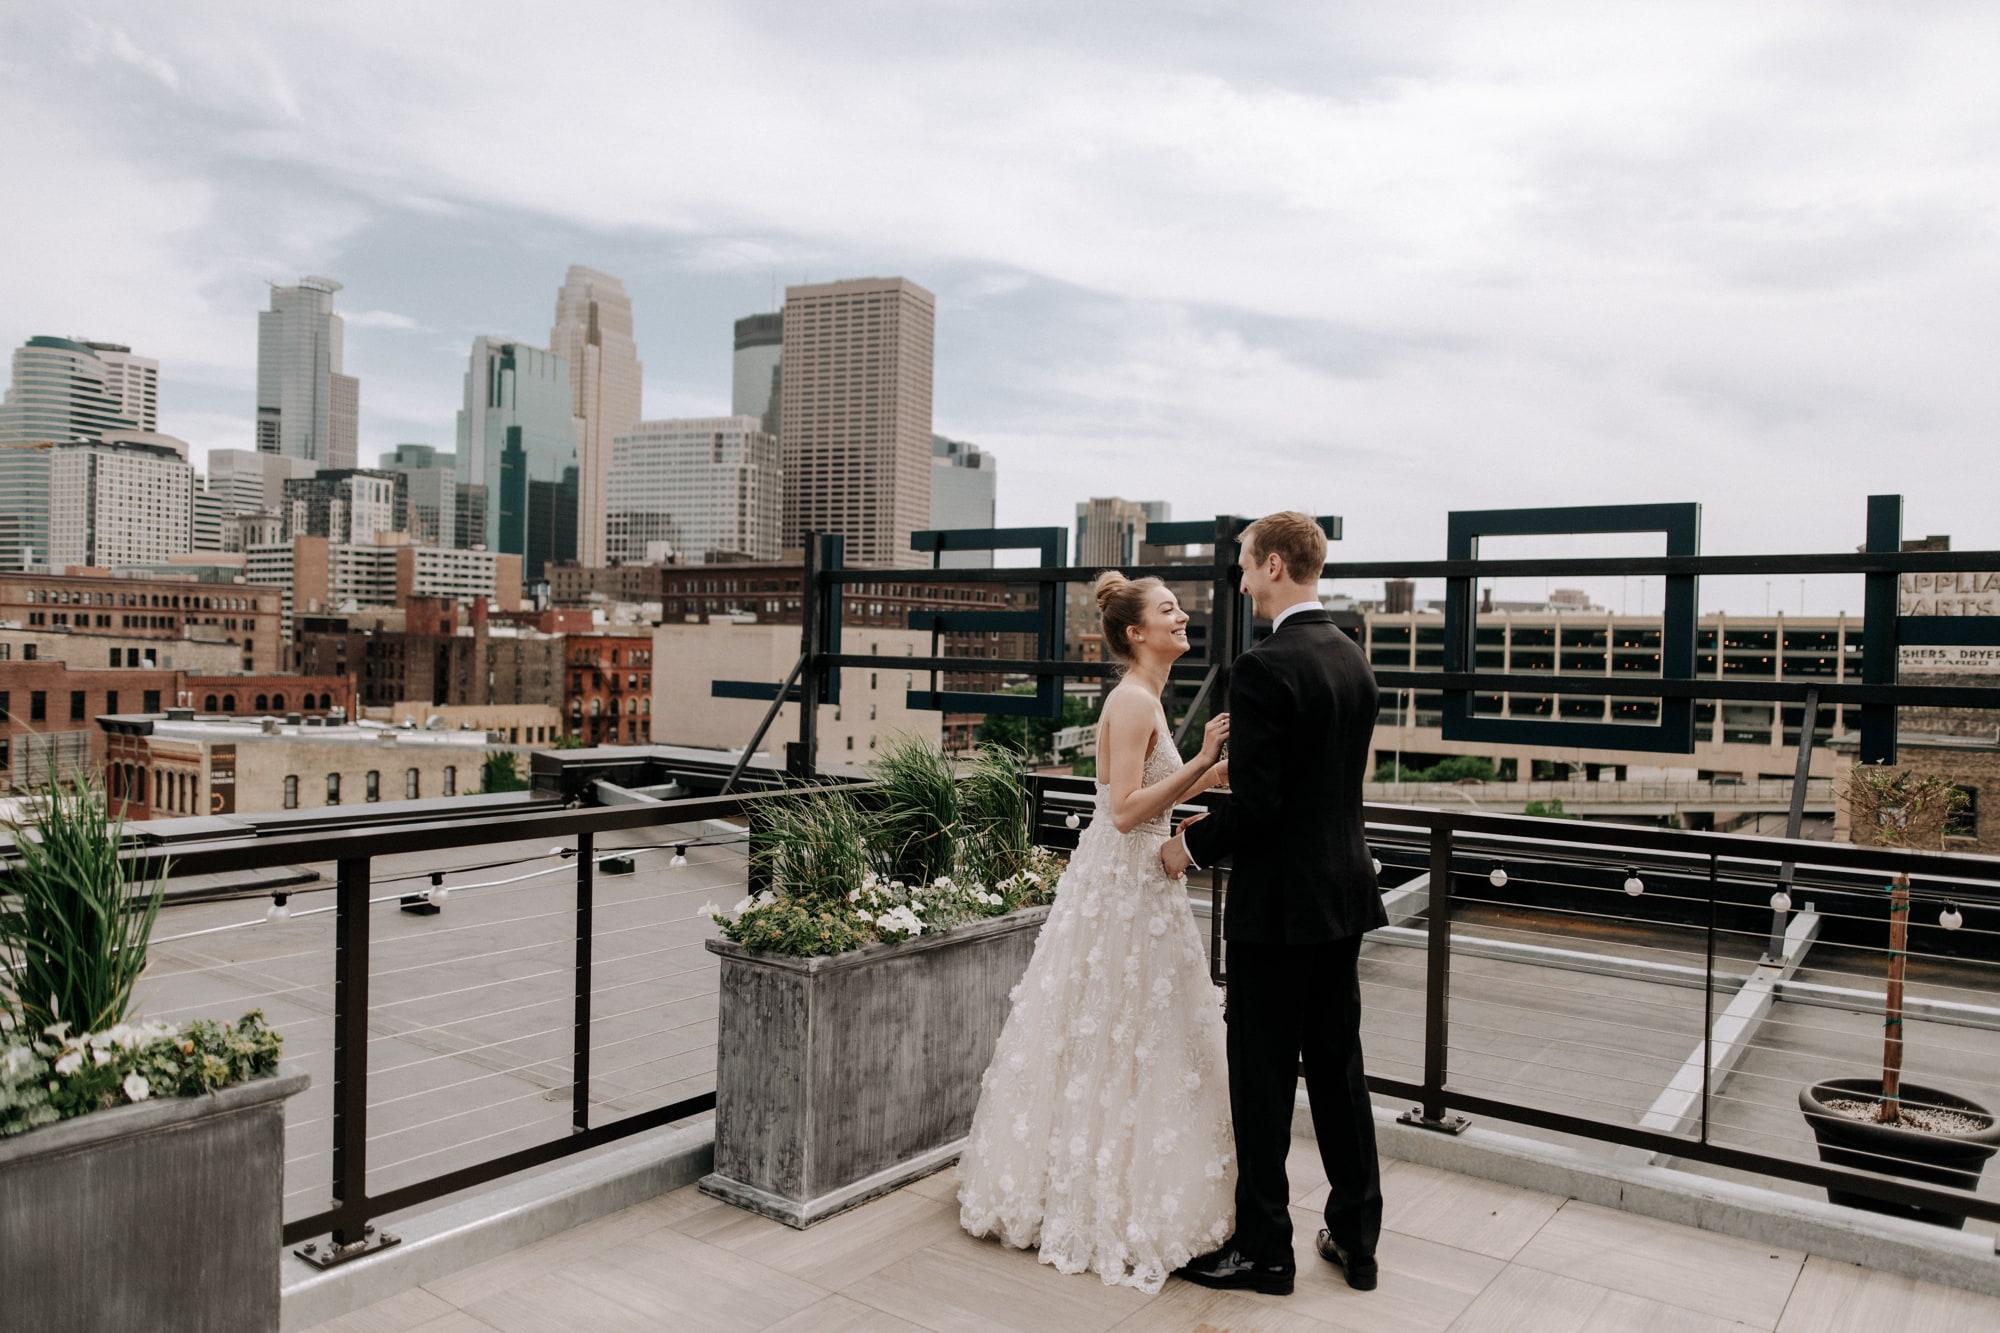 MIA-Minneapolis-Institute-Art-Summer-Wedding-_11.jpg